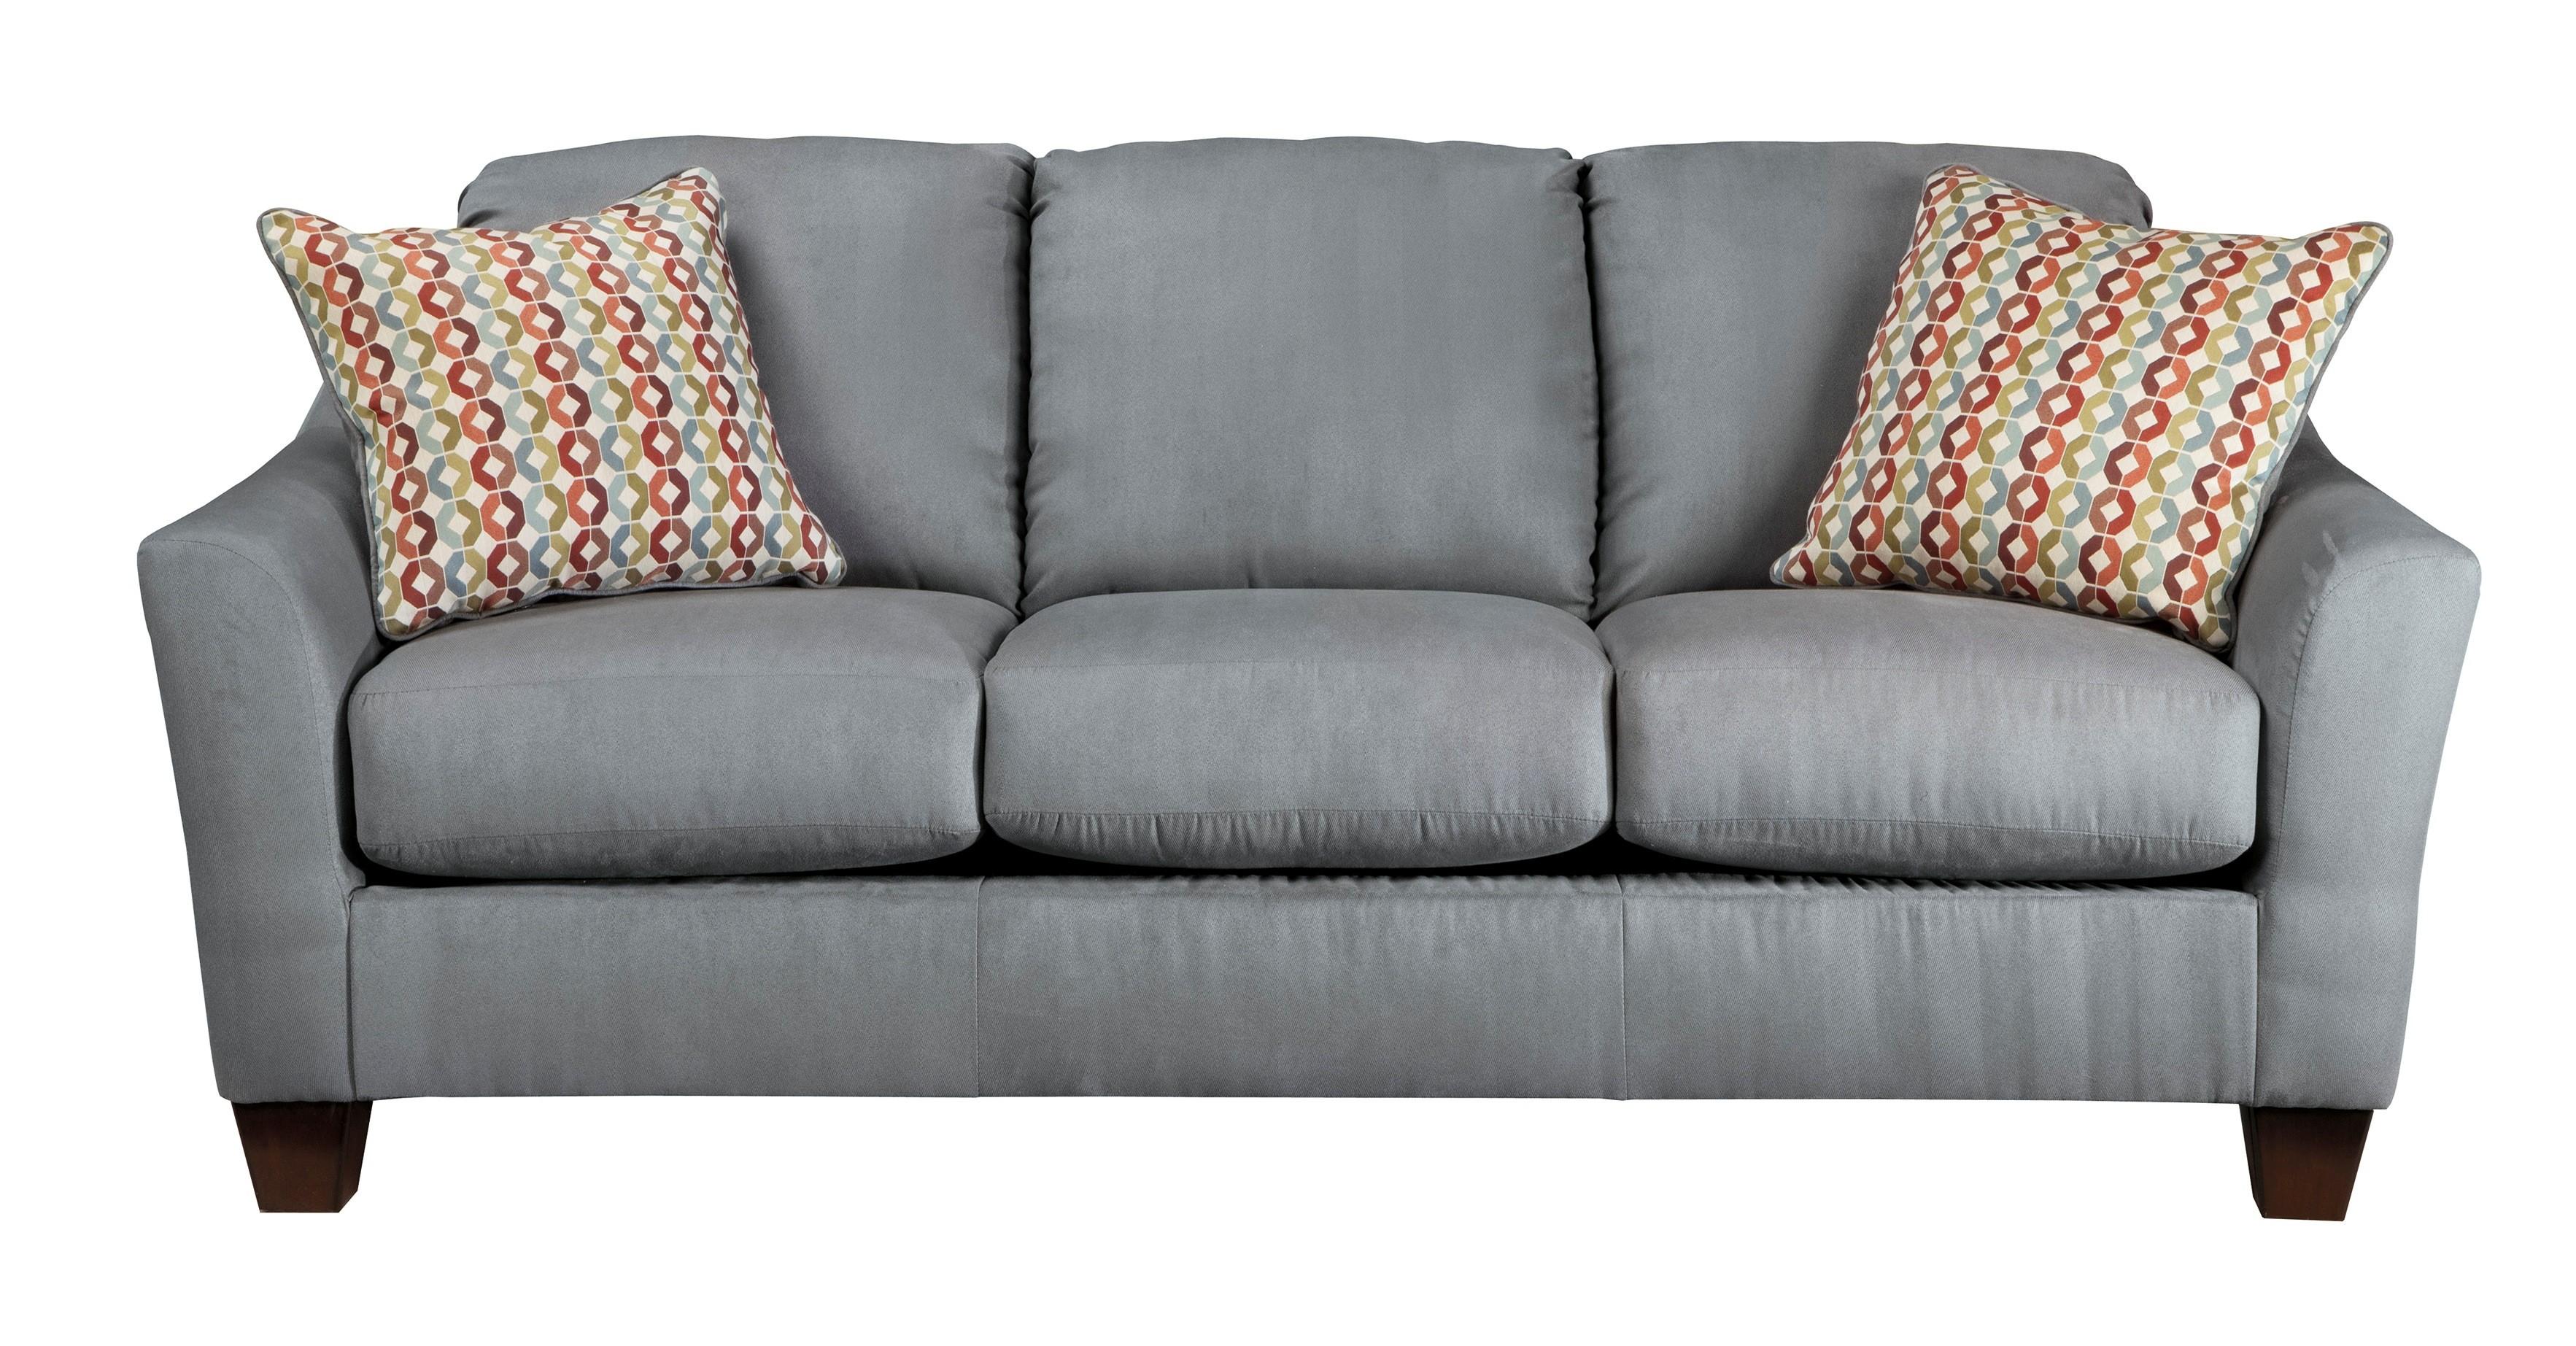 sleeper sofa ashley photo - 9